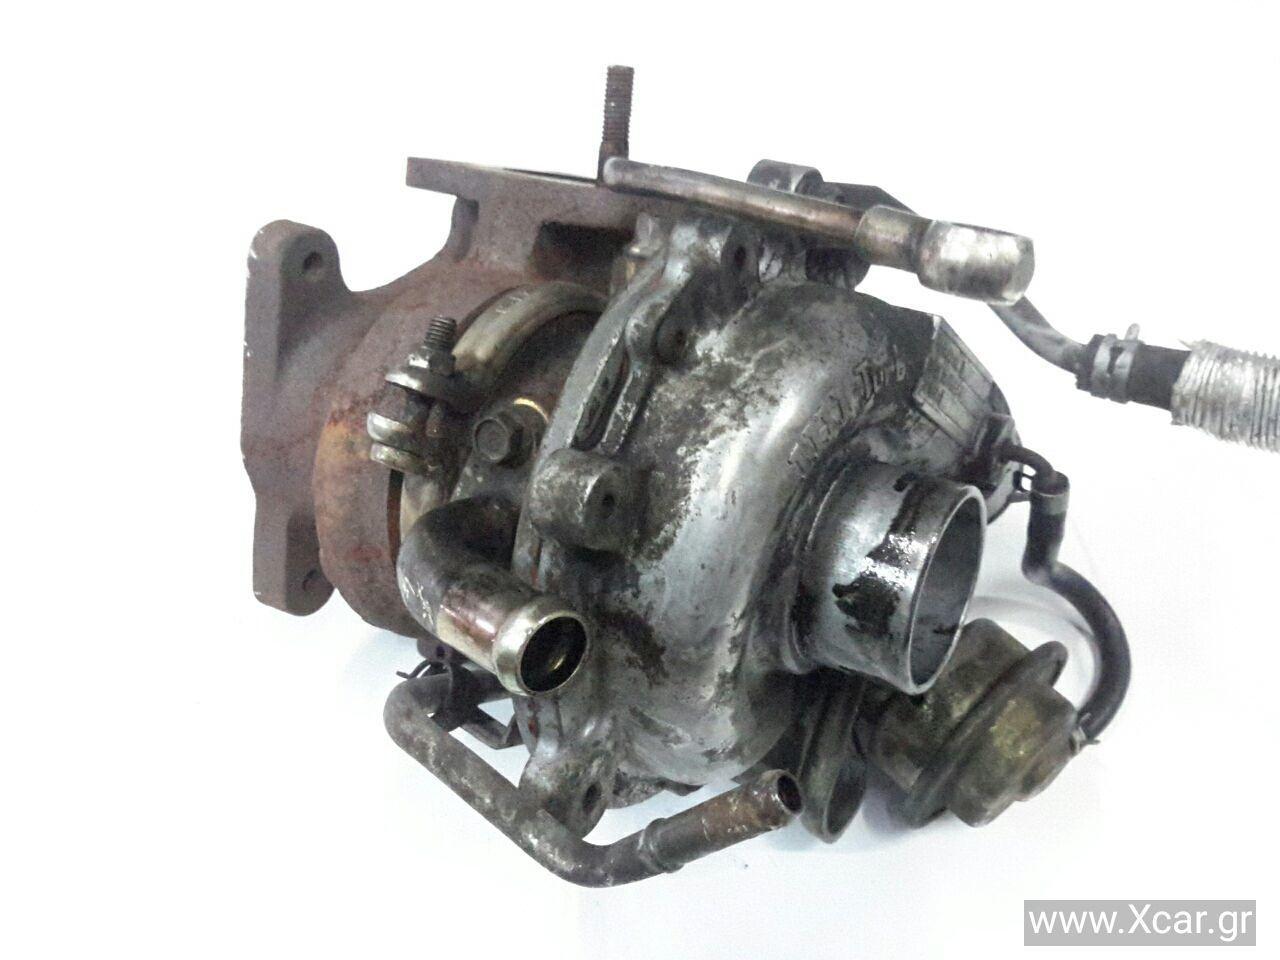 Turbo-Τουρμπίνα FORD RANGER Pick-Up / 2WD / Μονη Καμπίνα 1999 - 2003 ( TU_  } 2500 ( WL  } Diesel 78 #VJ330407